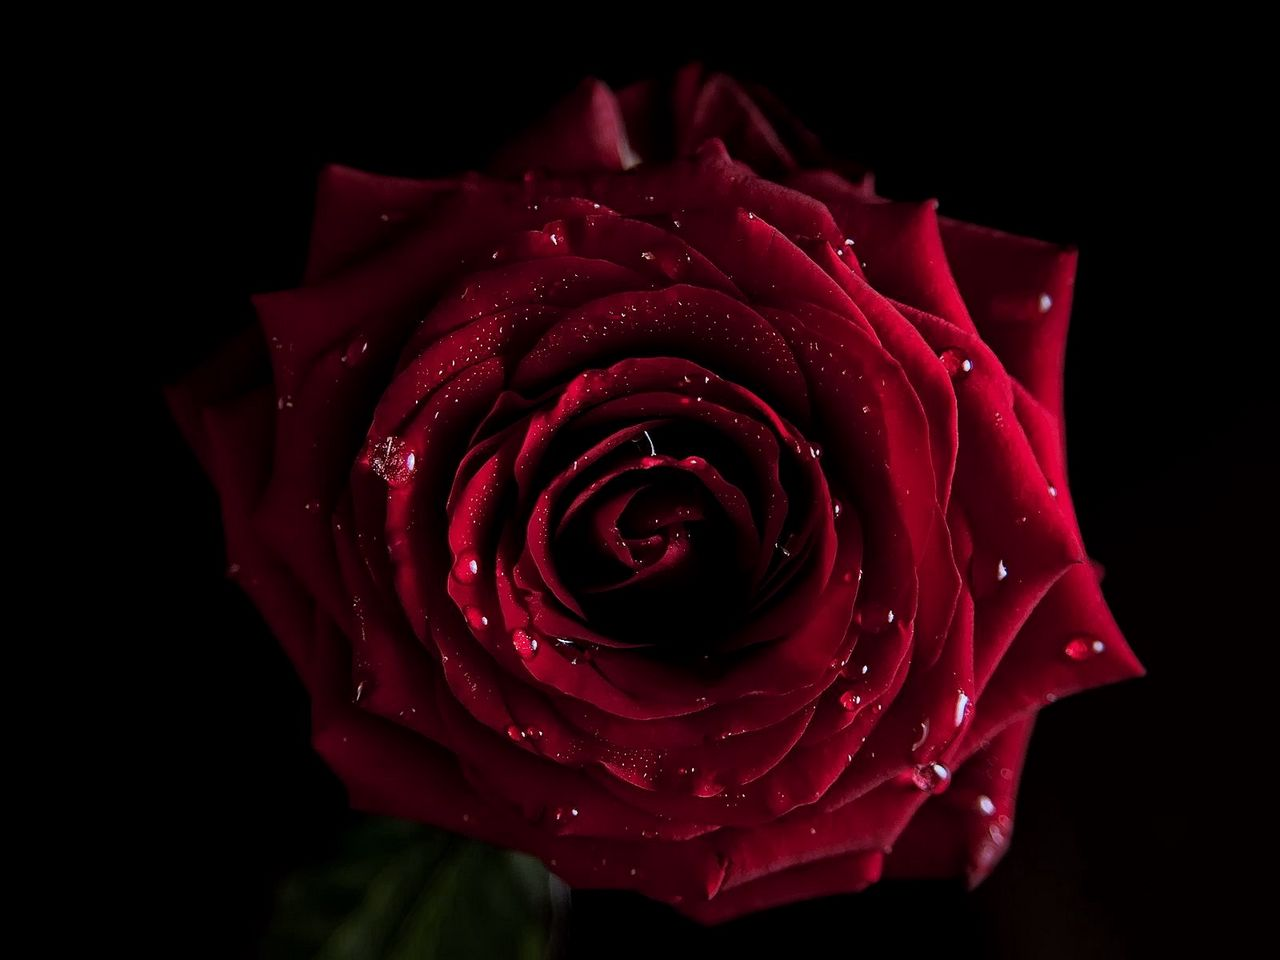 1280x960 Wallpaper red, flowers, macro, rose